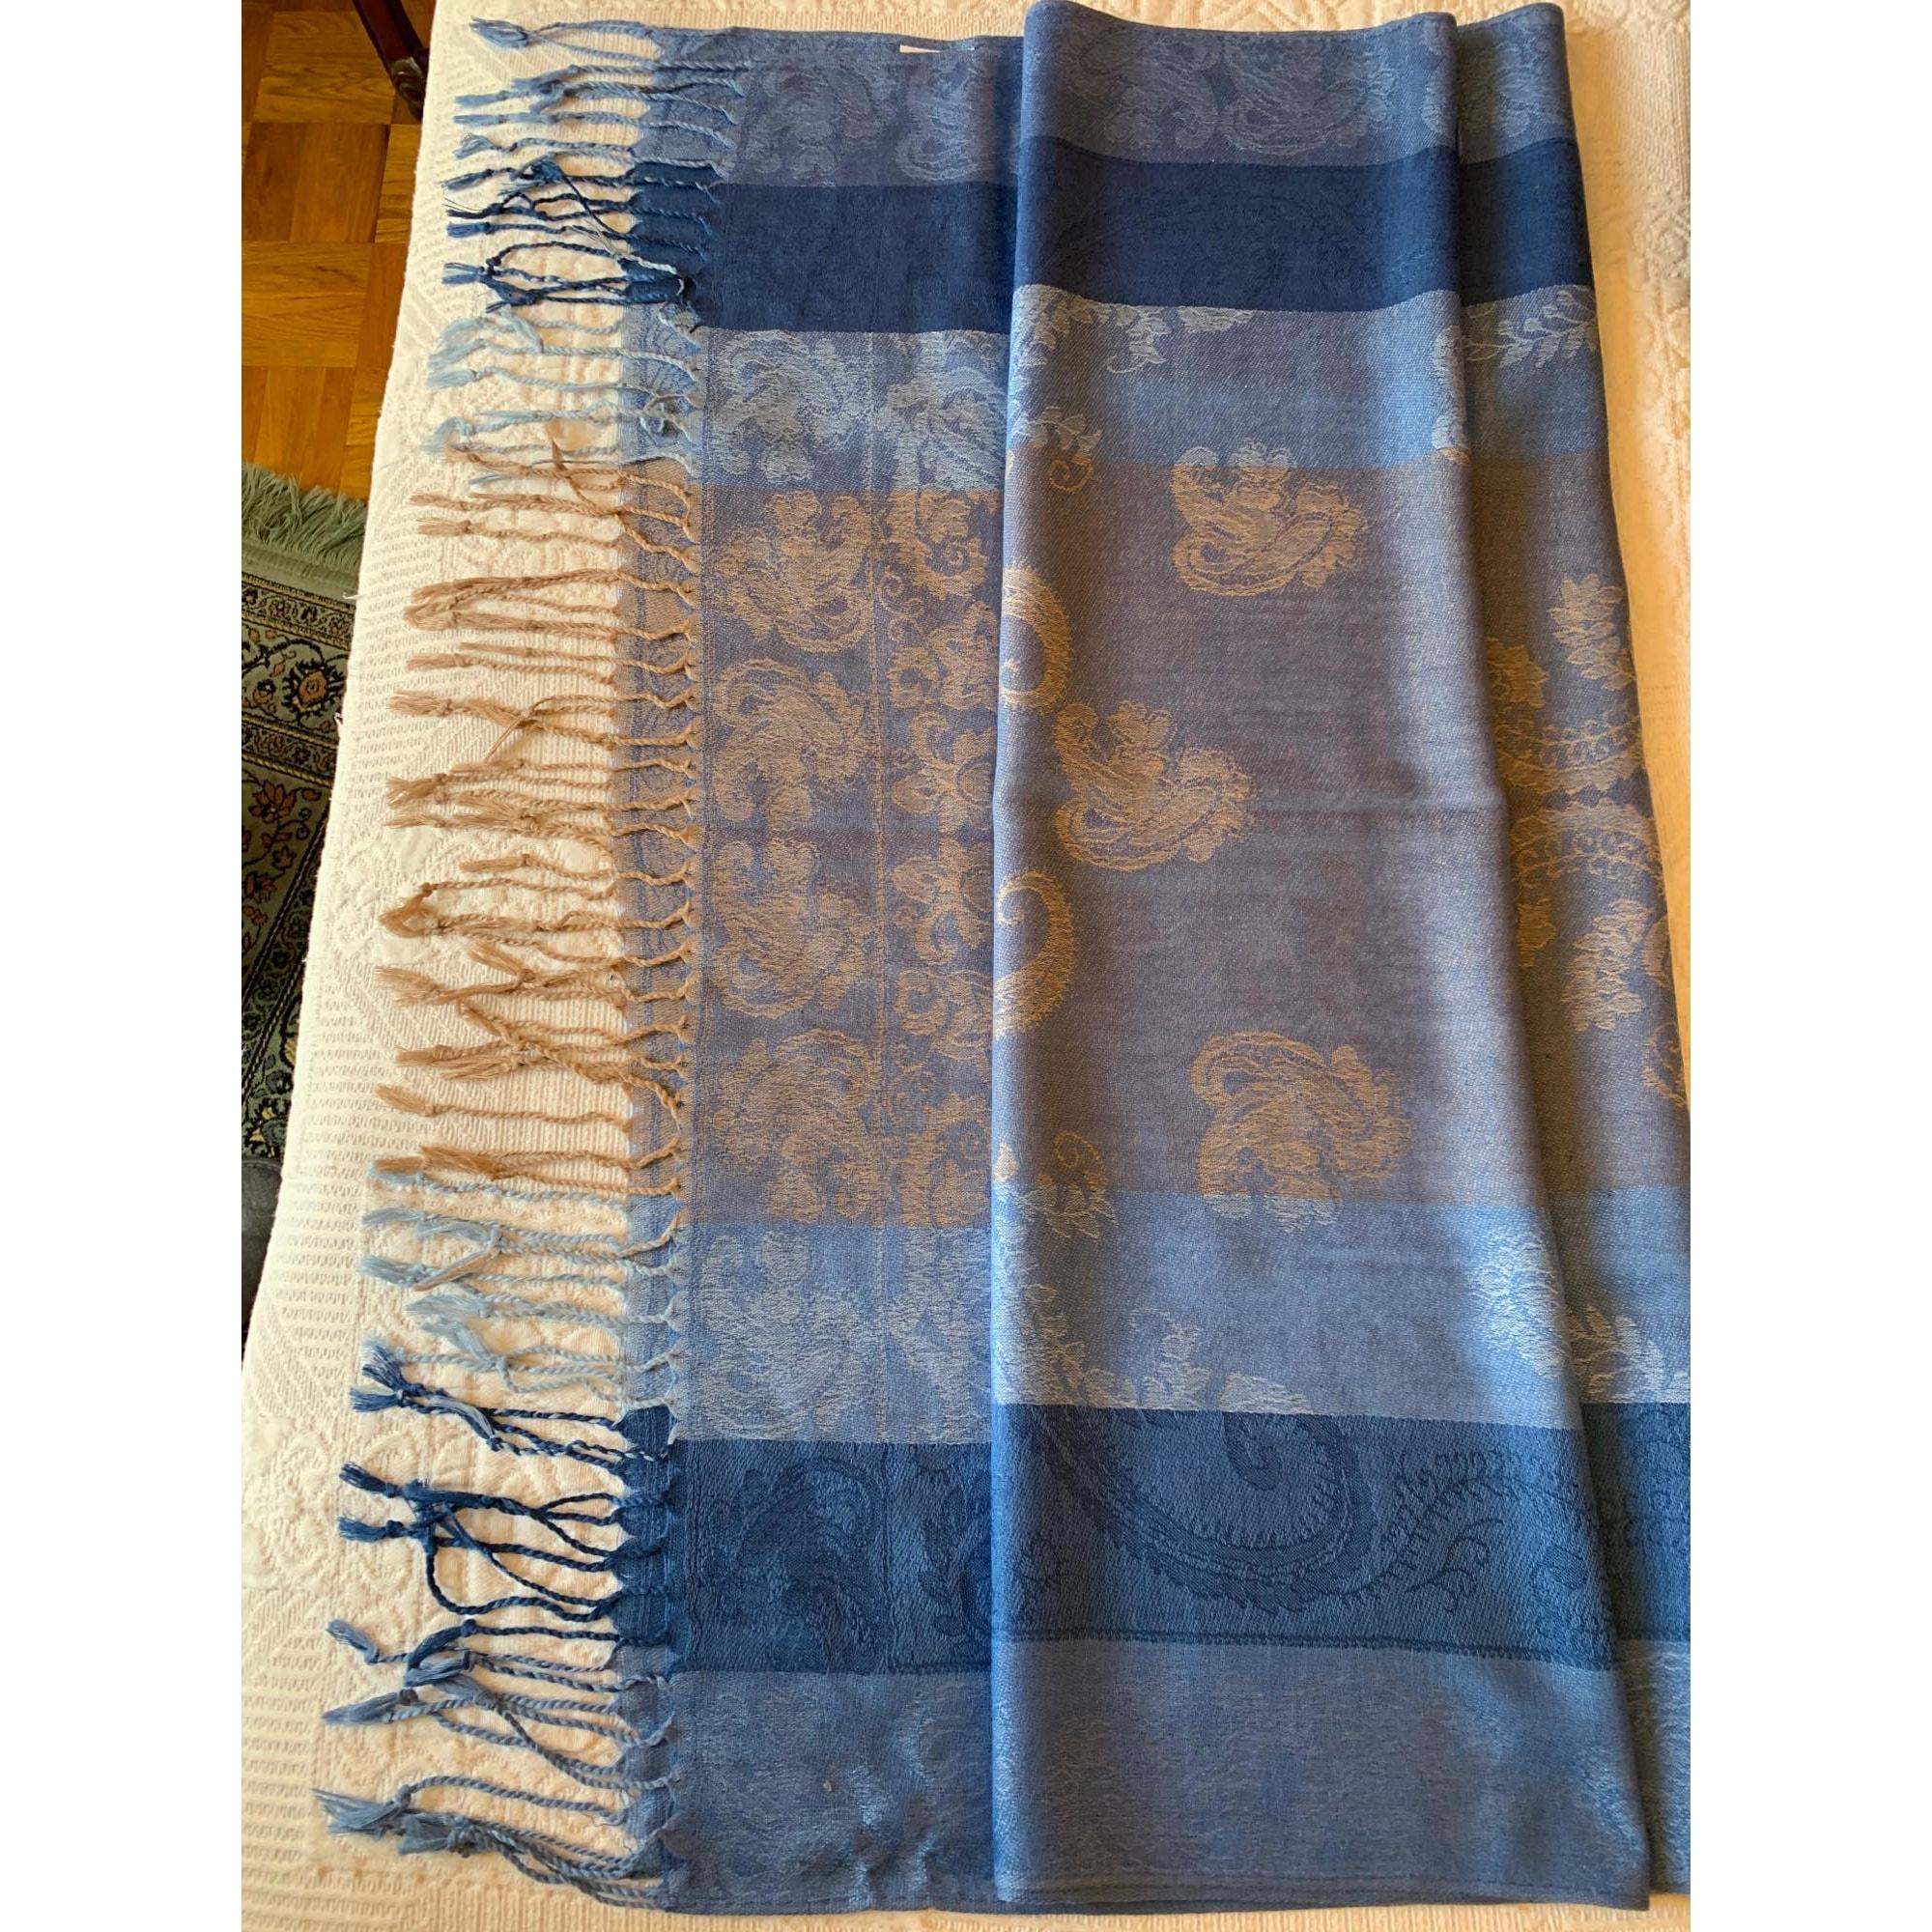 Etole NATHALIE ANDERSEN POUR DAMART Bleu, bleu marine, bleu turquoise